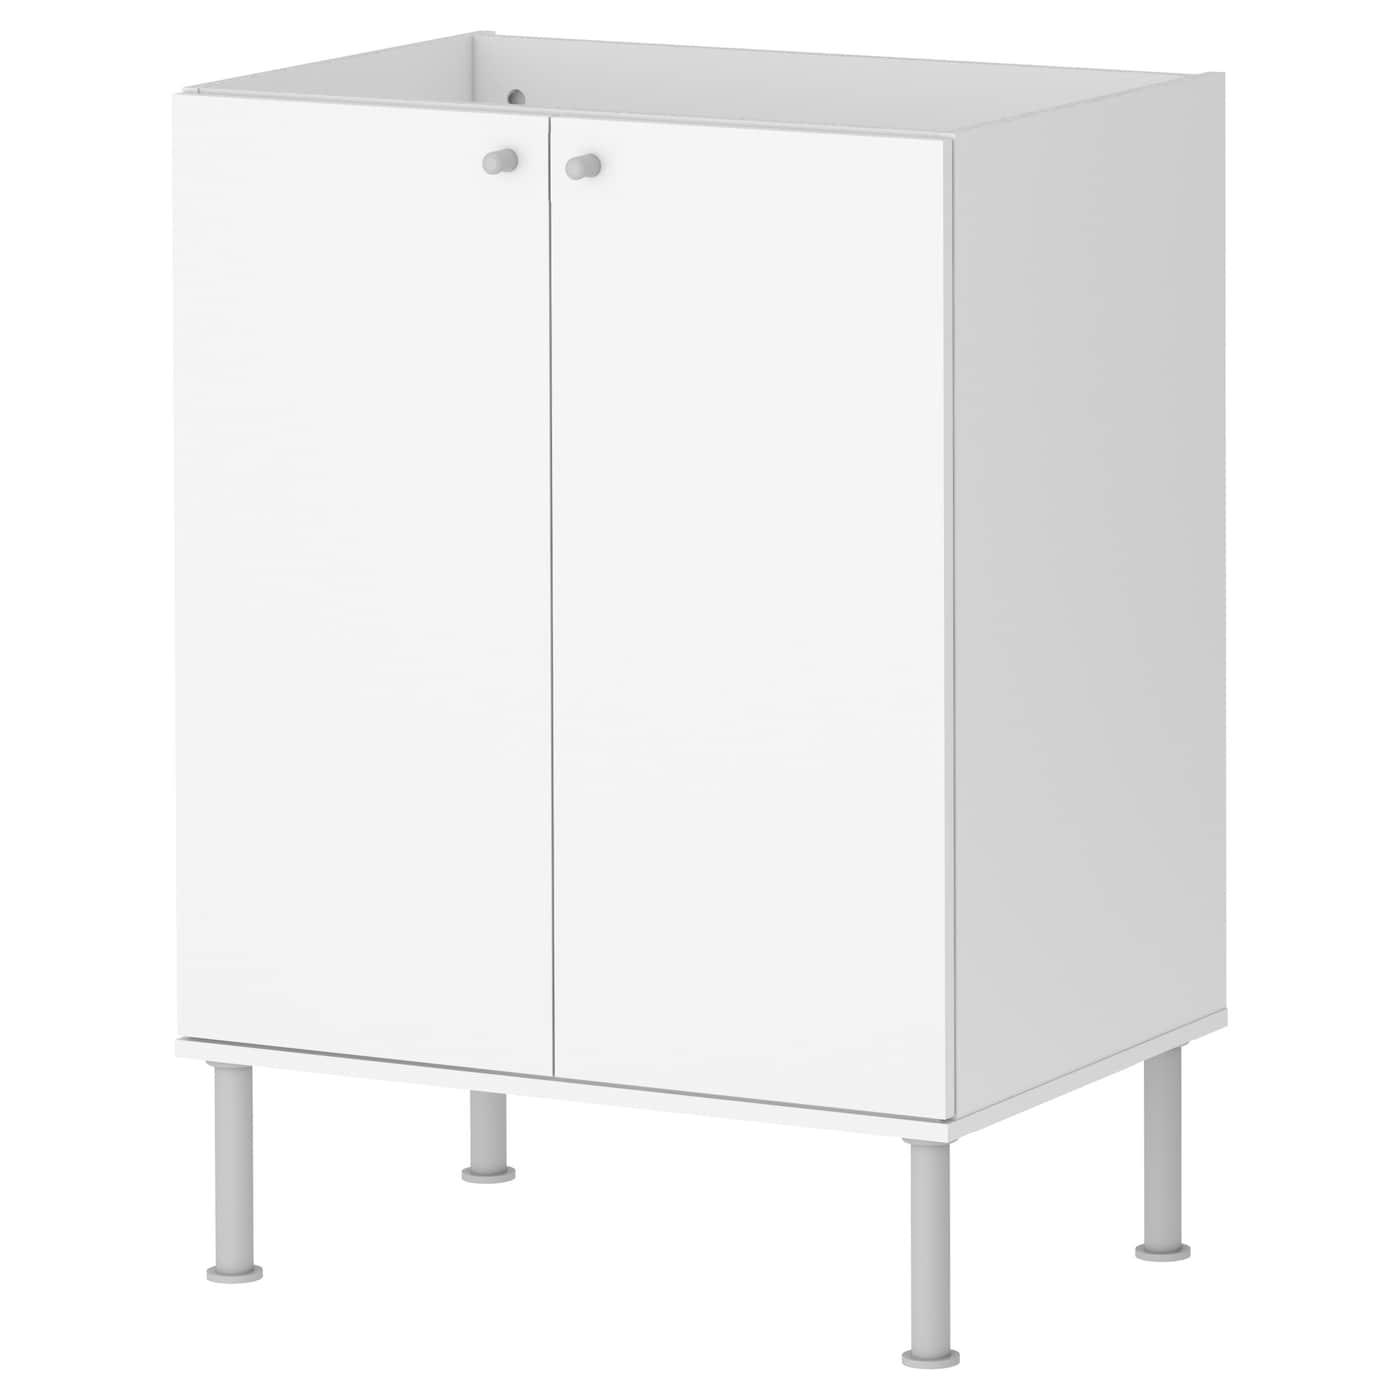 IKEA FULLEN wash basin cabinet. FULLEN Wash basin cabinet White 60x79 cm   IKEA